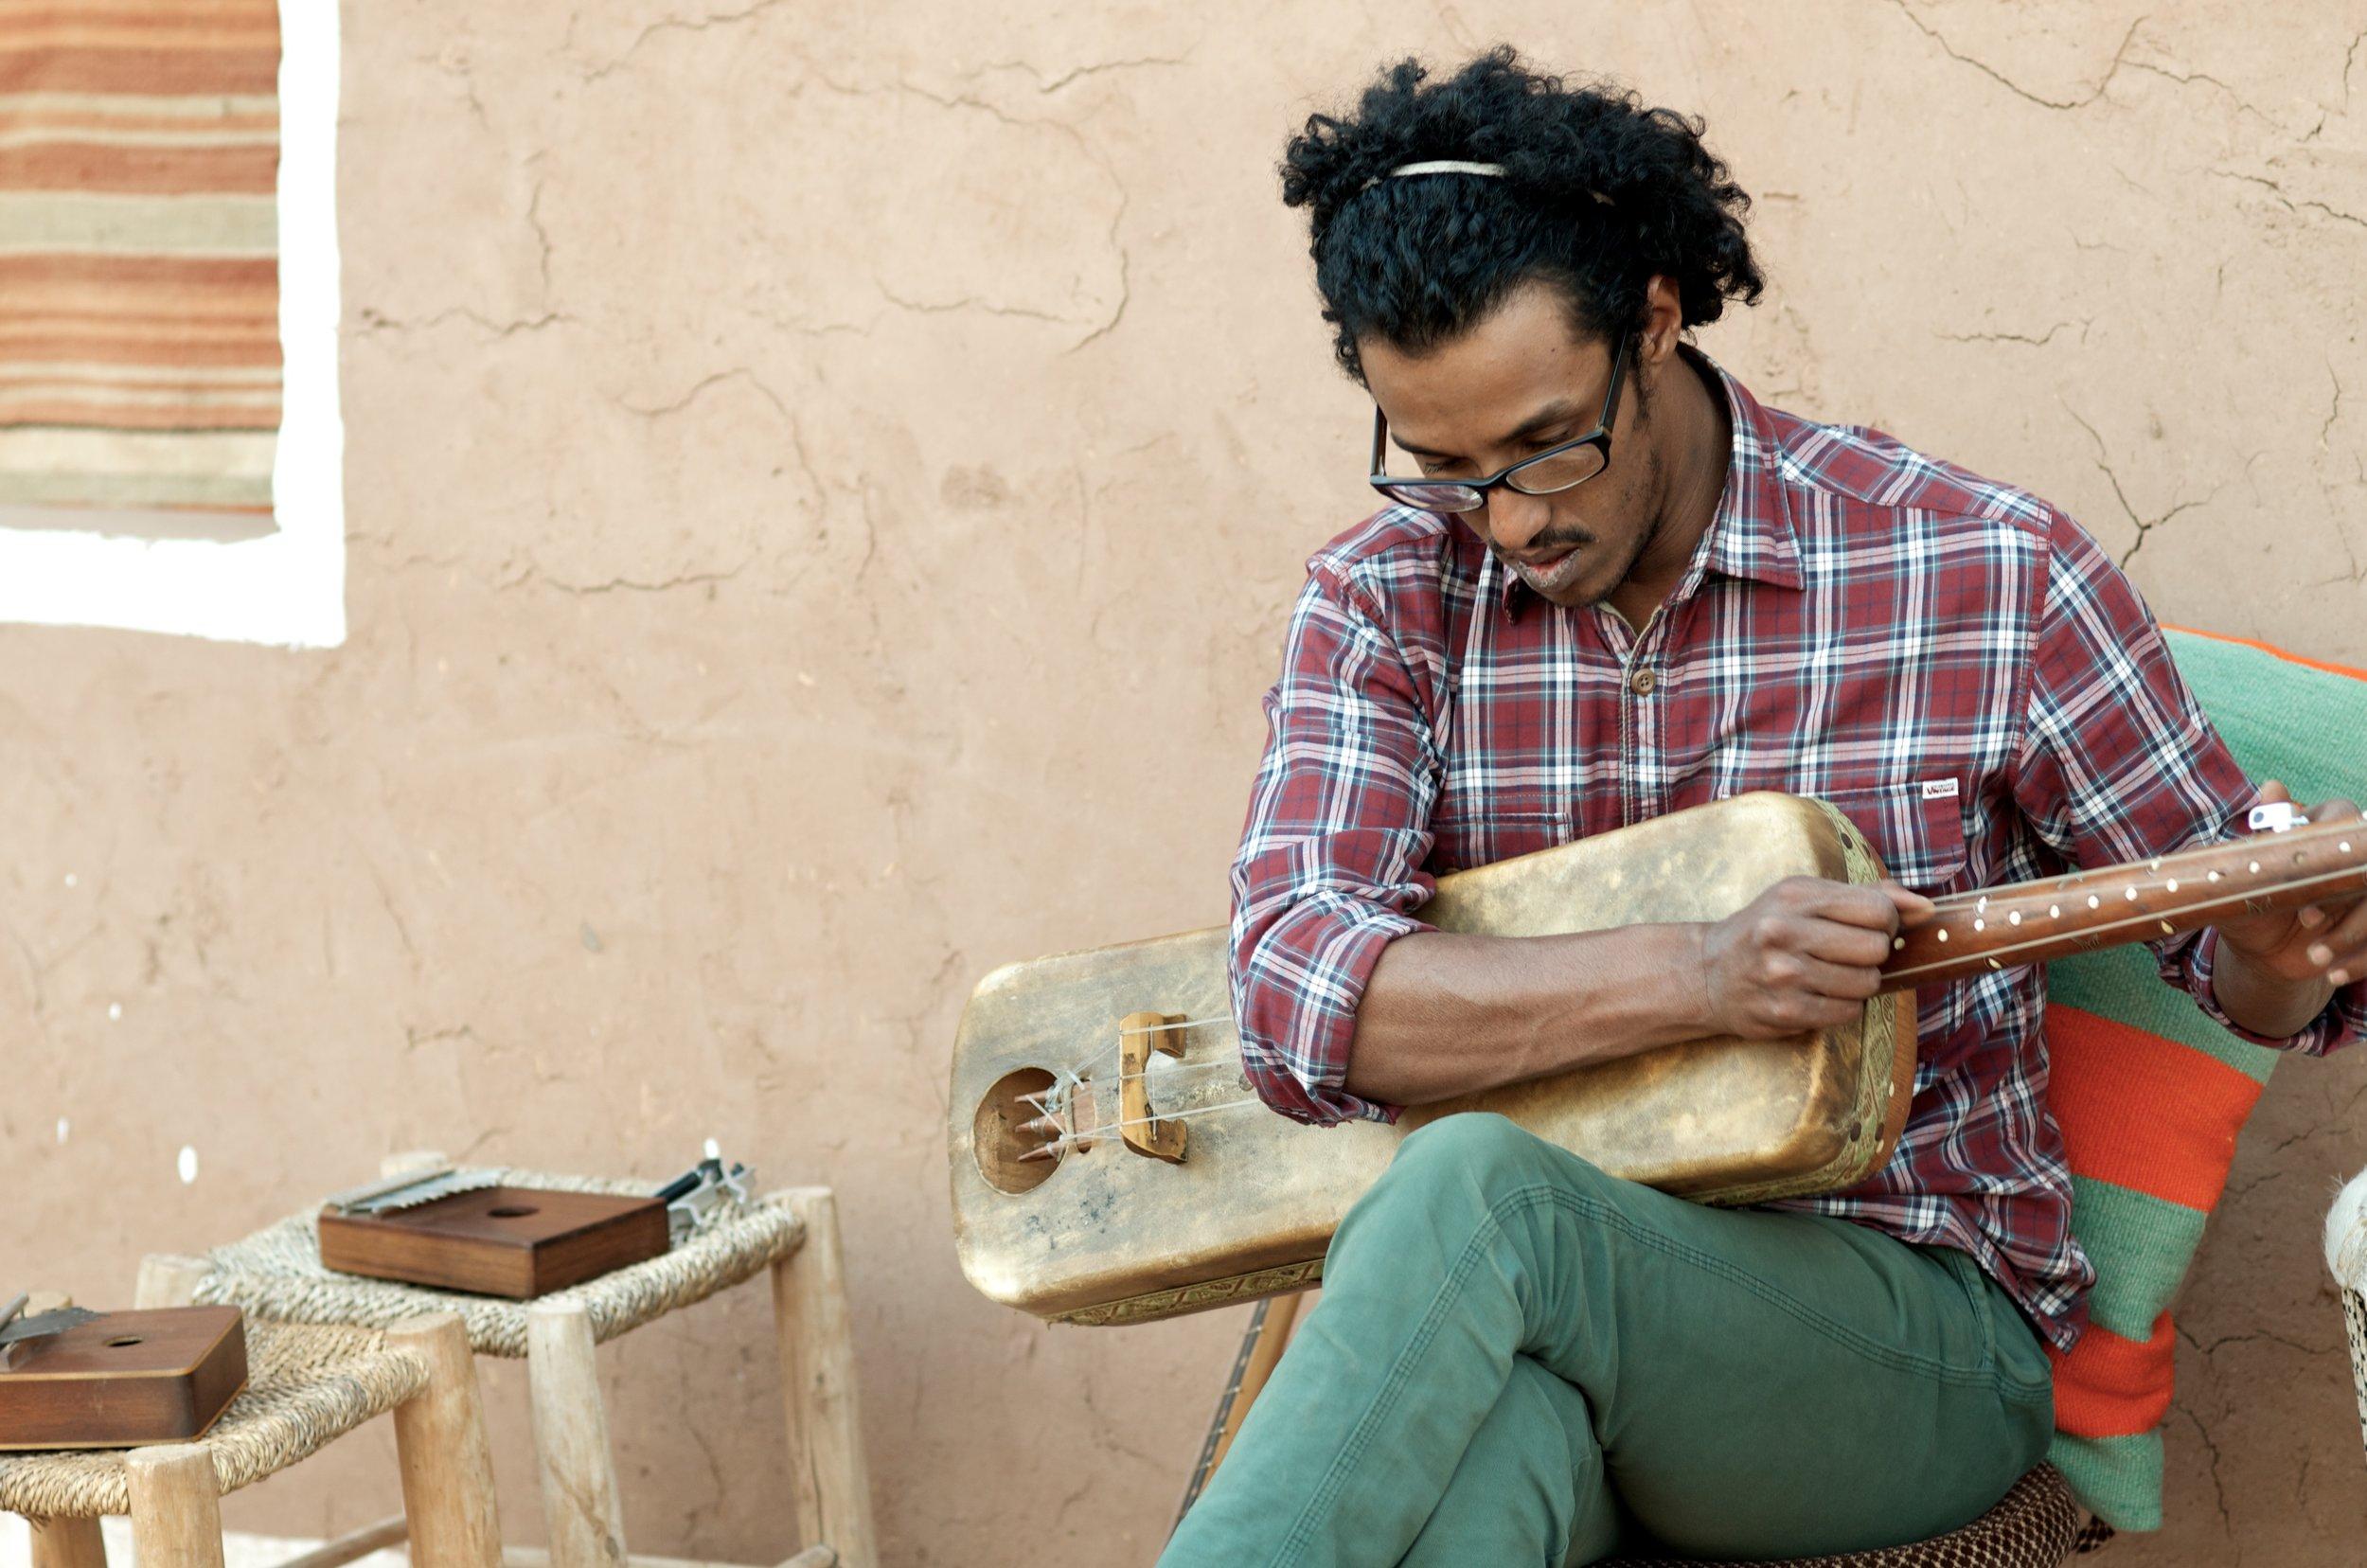 Mourad Belouadi (Morocco) - We called him